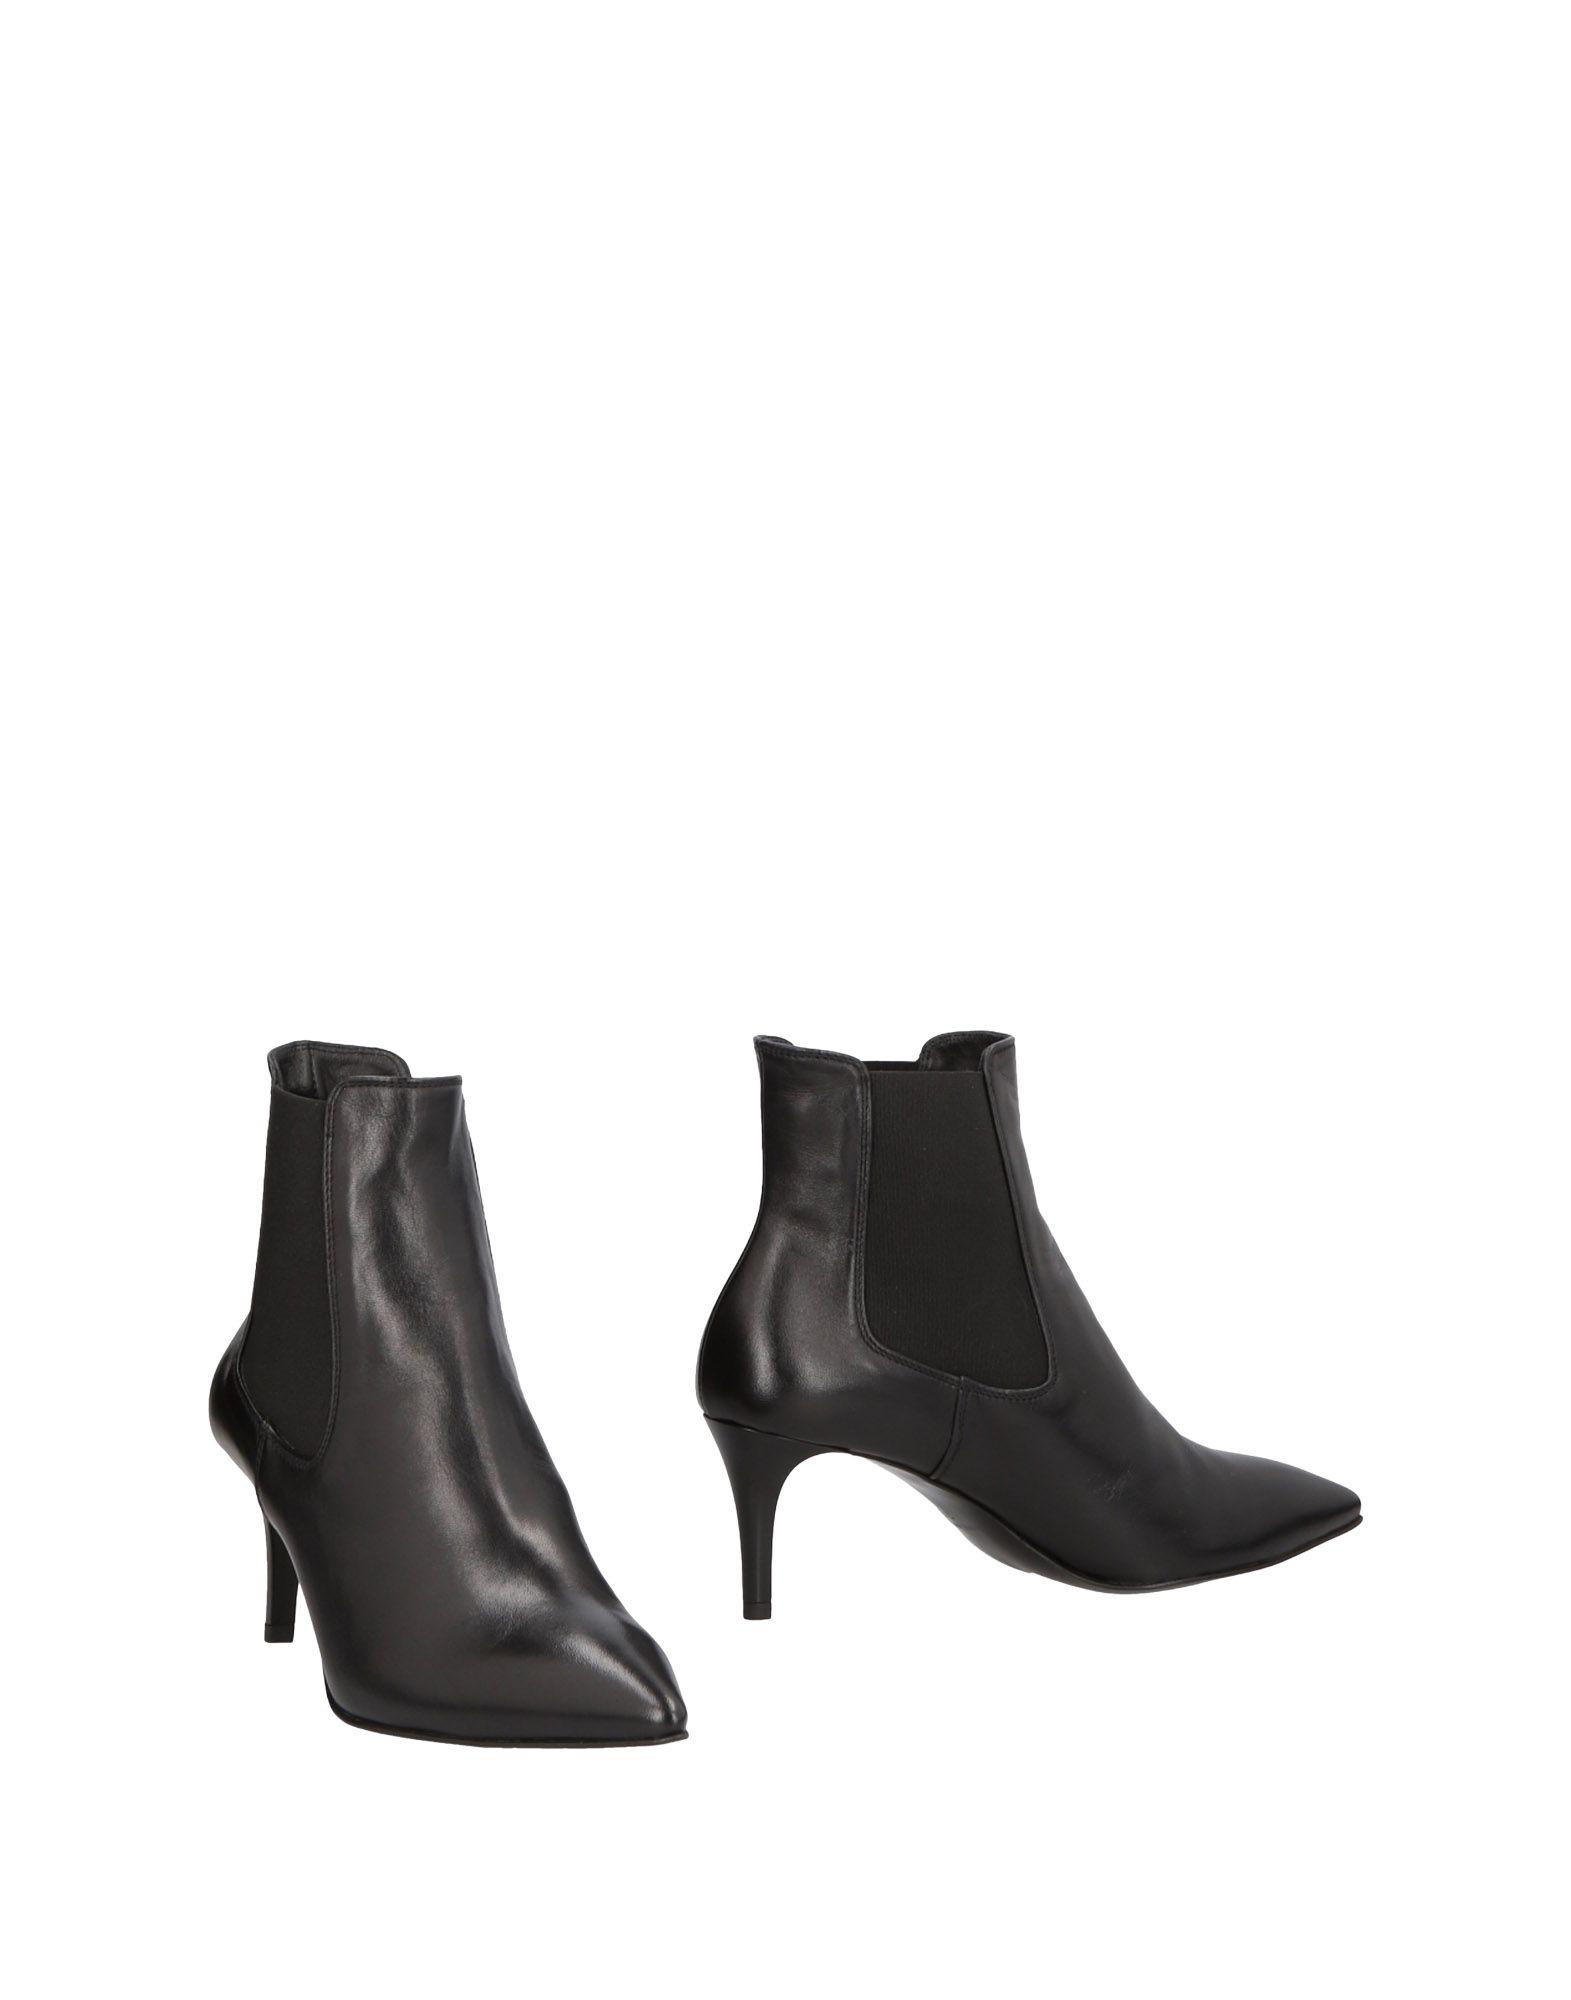 P.A.R.O.S.H. Полусапоги и высокие ботинки hecon полусапоги и высокие ботинки